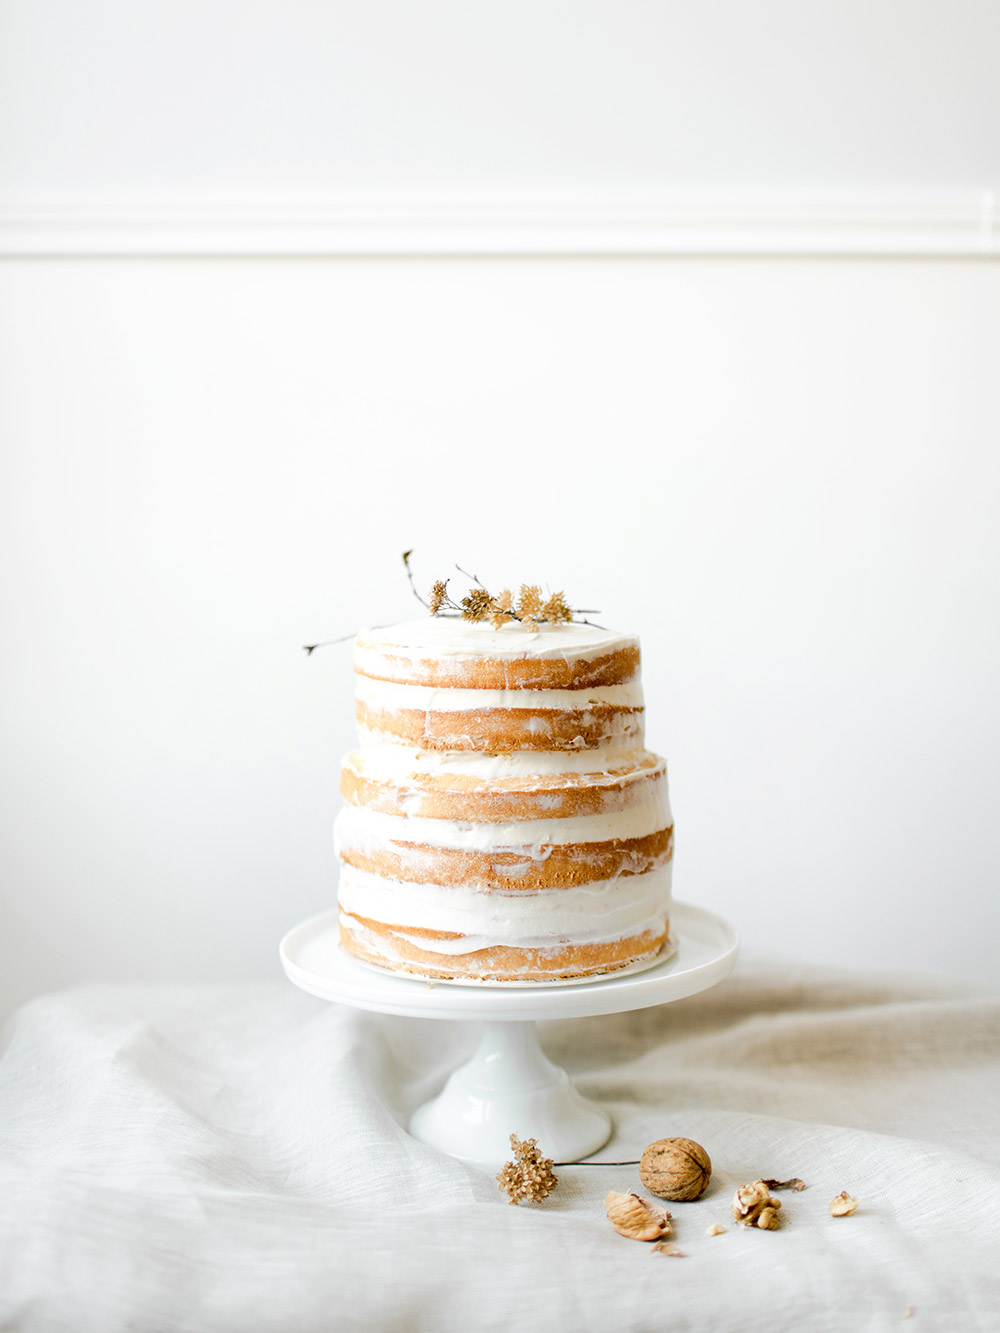 Blanccoco_Photographe_Naked_Styliste_Culinaire_Food_Stylist-1c